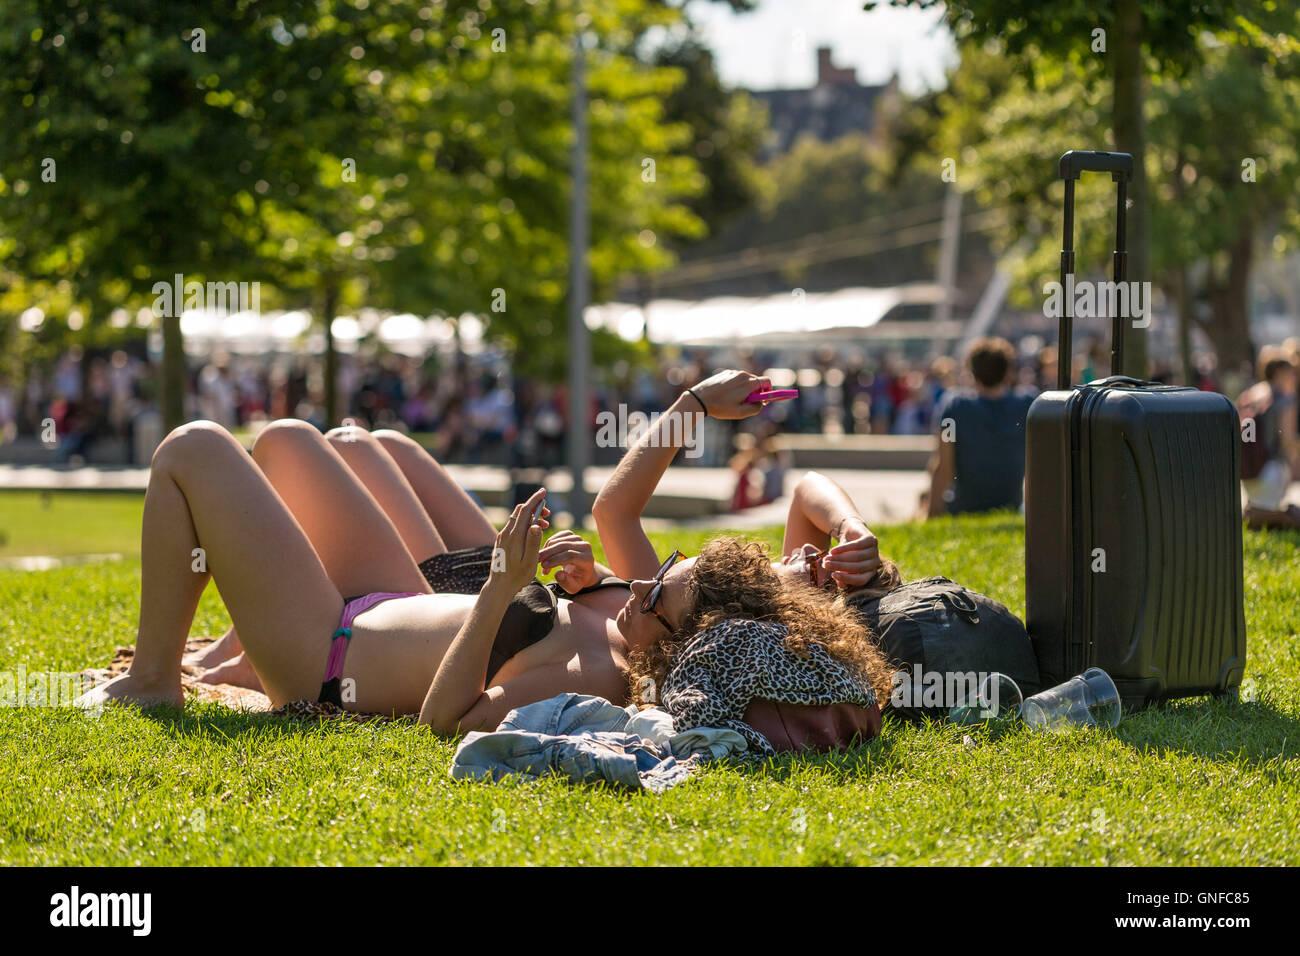 London, UK. 30th August, 2016. UK Weather: Londoners enjoy the city heatwave in Jubilee Gardens Credit:  Guy Corbishley/Alamy - Stock Image